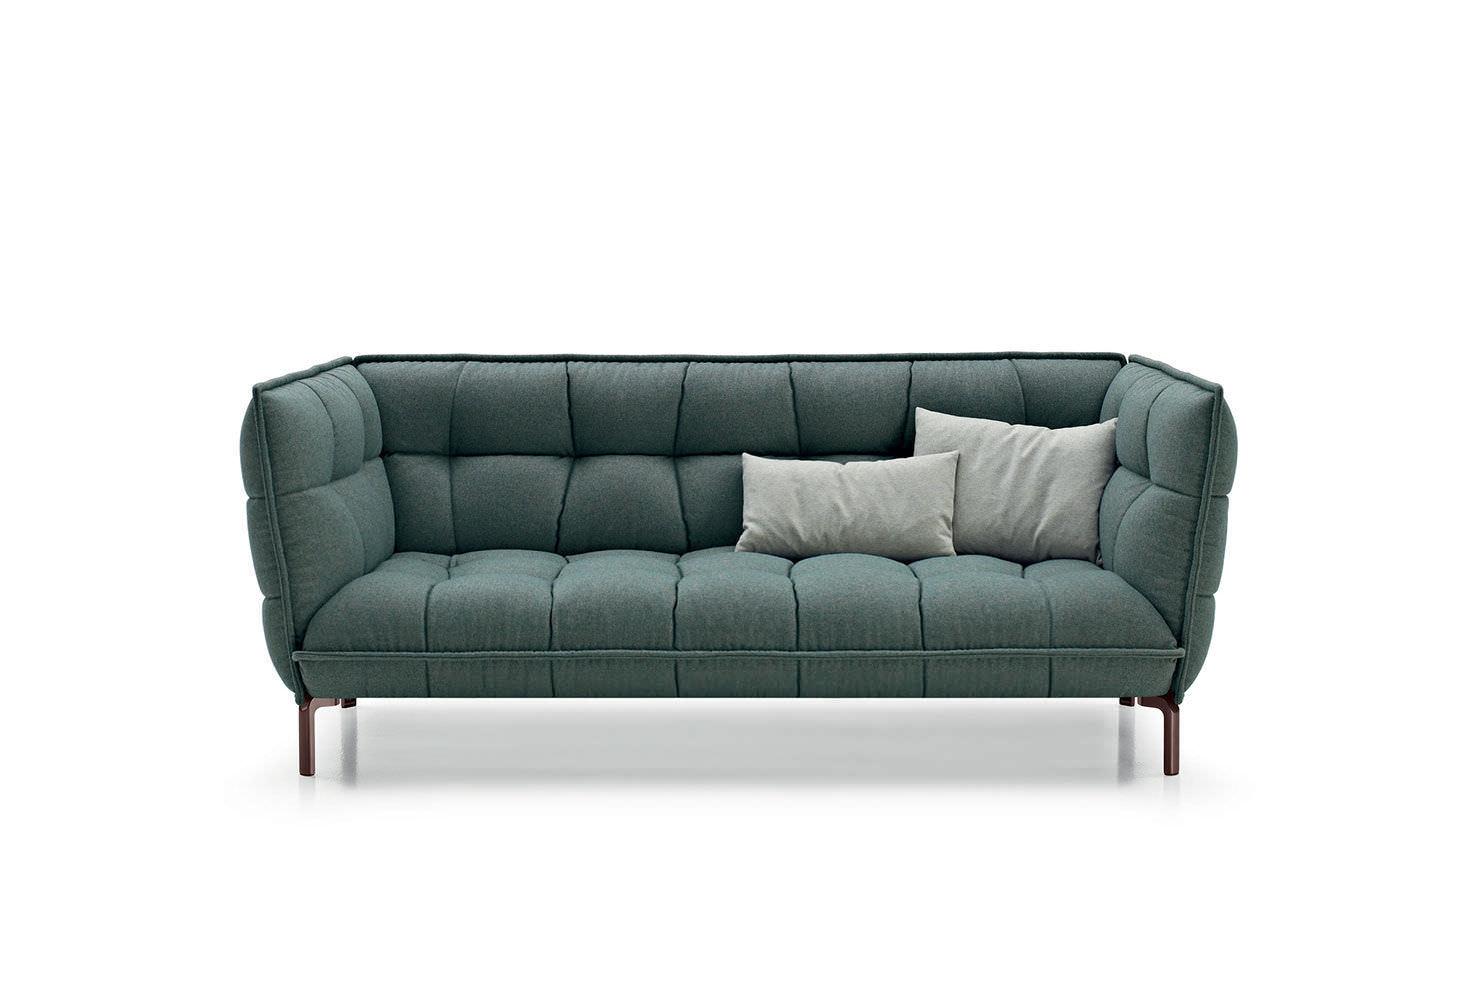 Contemporary sofa / fabric / by Patricia Urquiola / 2-seater ...